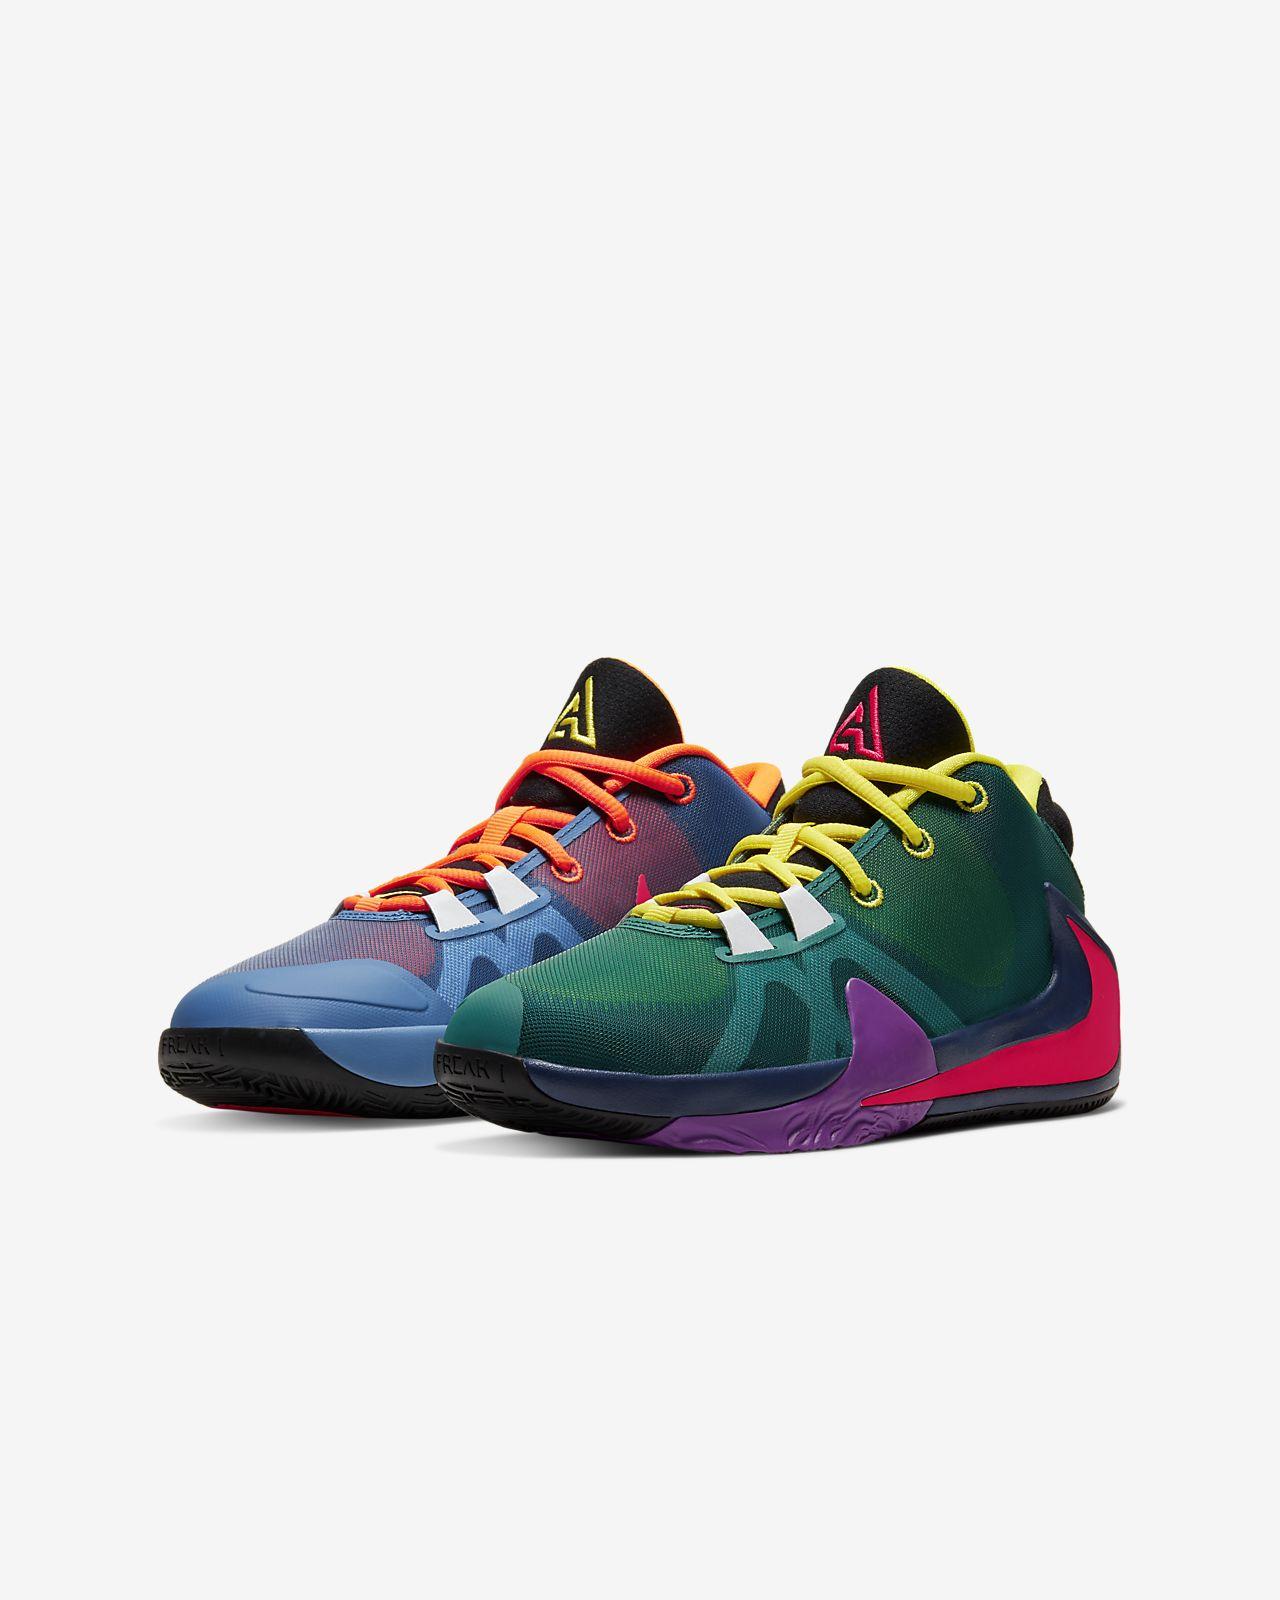 giannis antetokounmpo basketball shoes